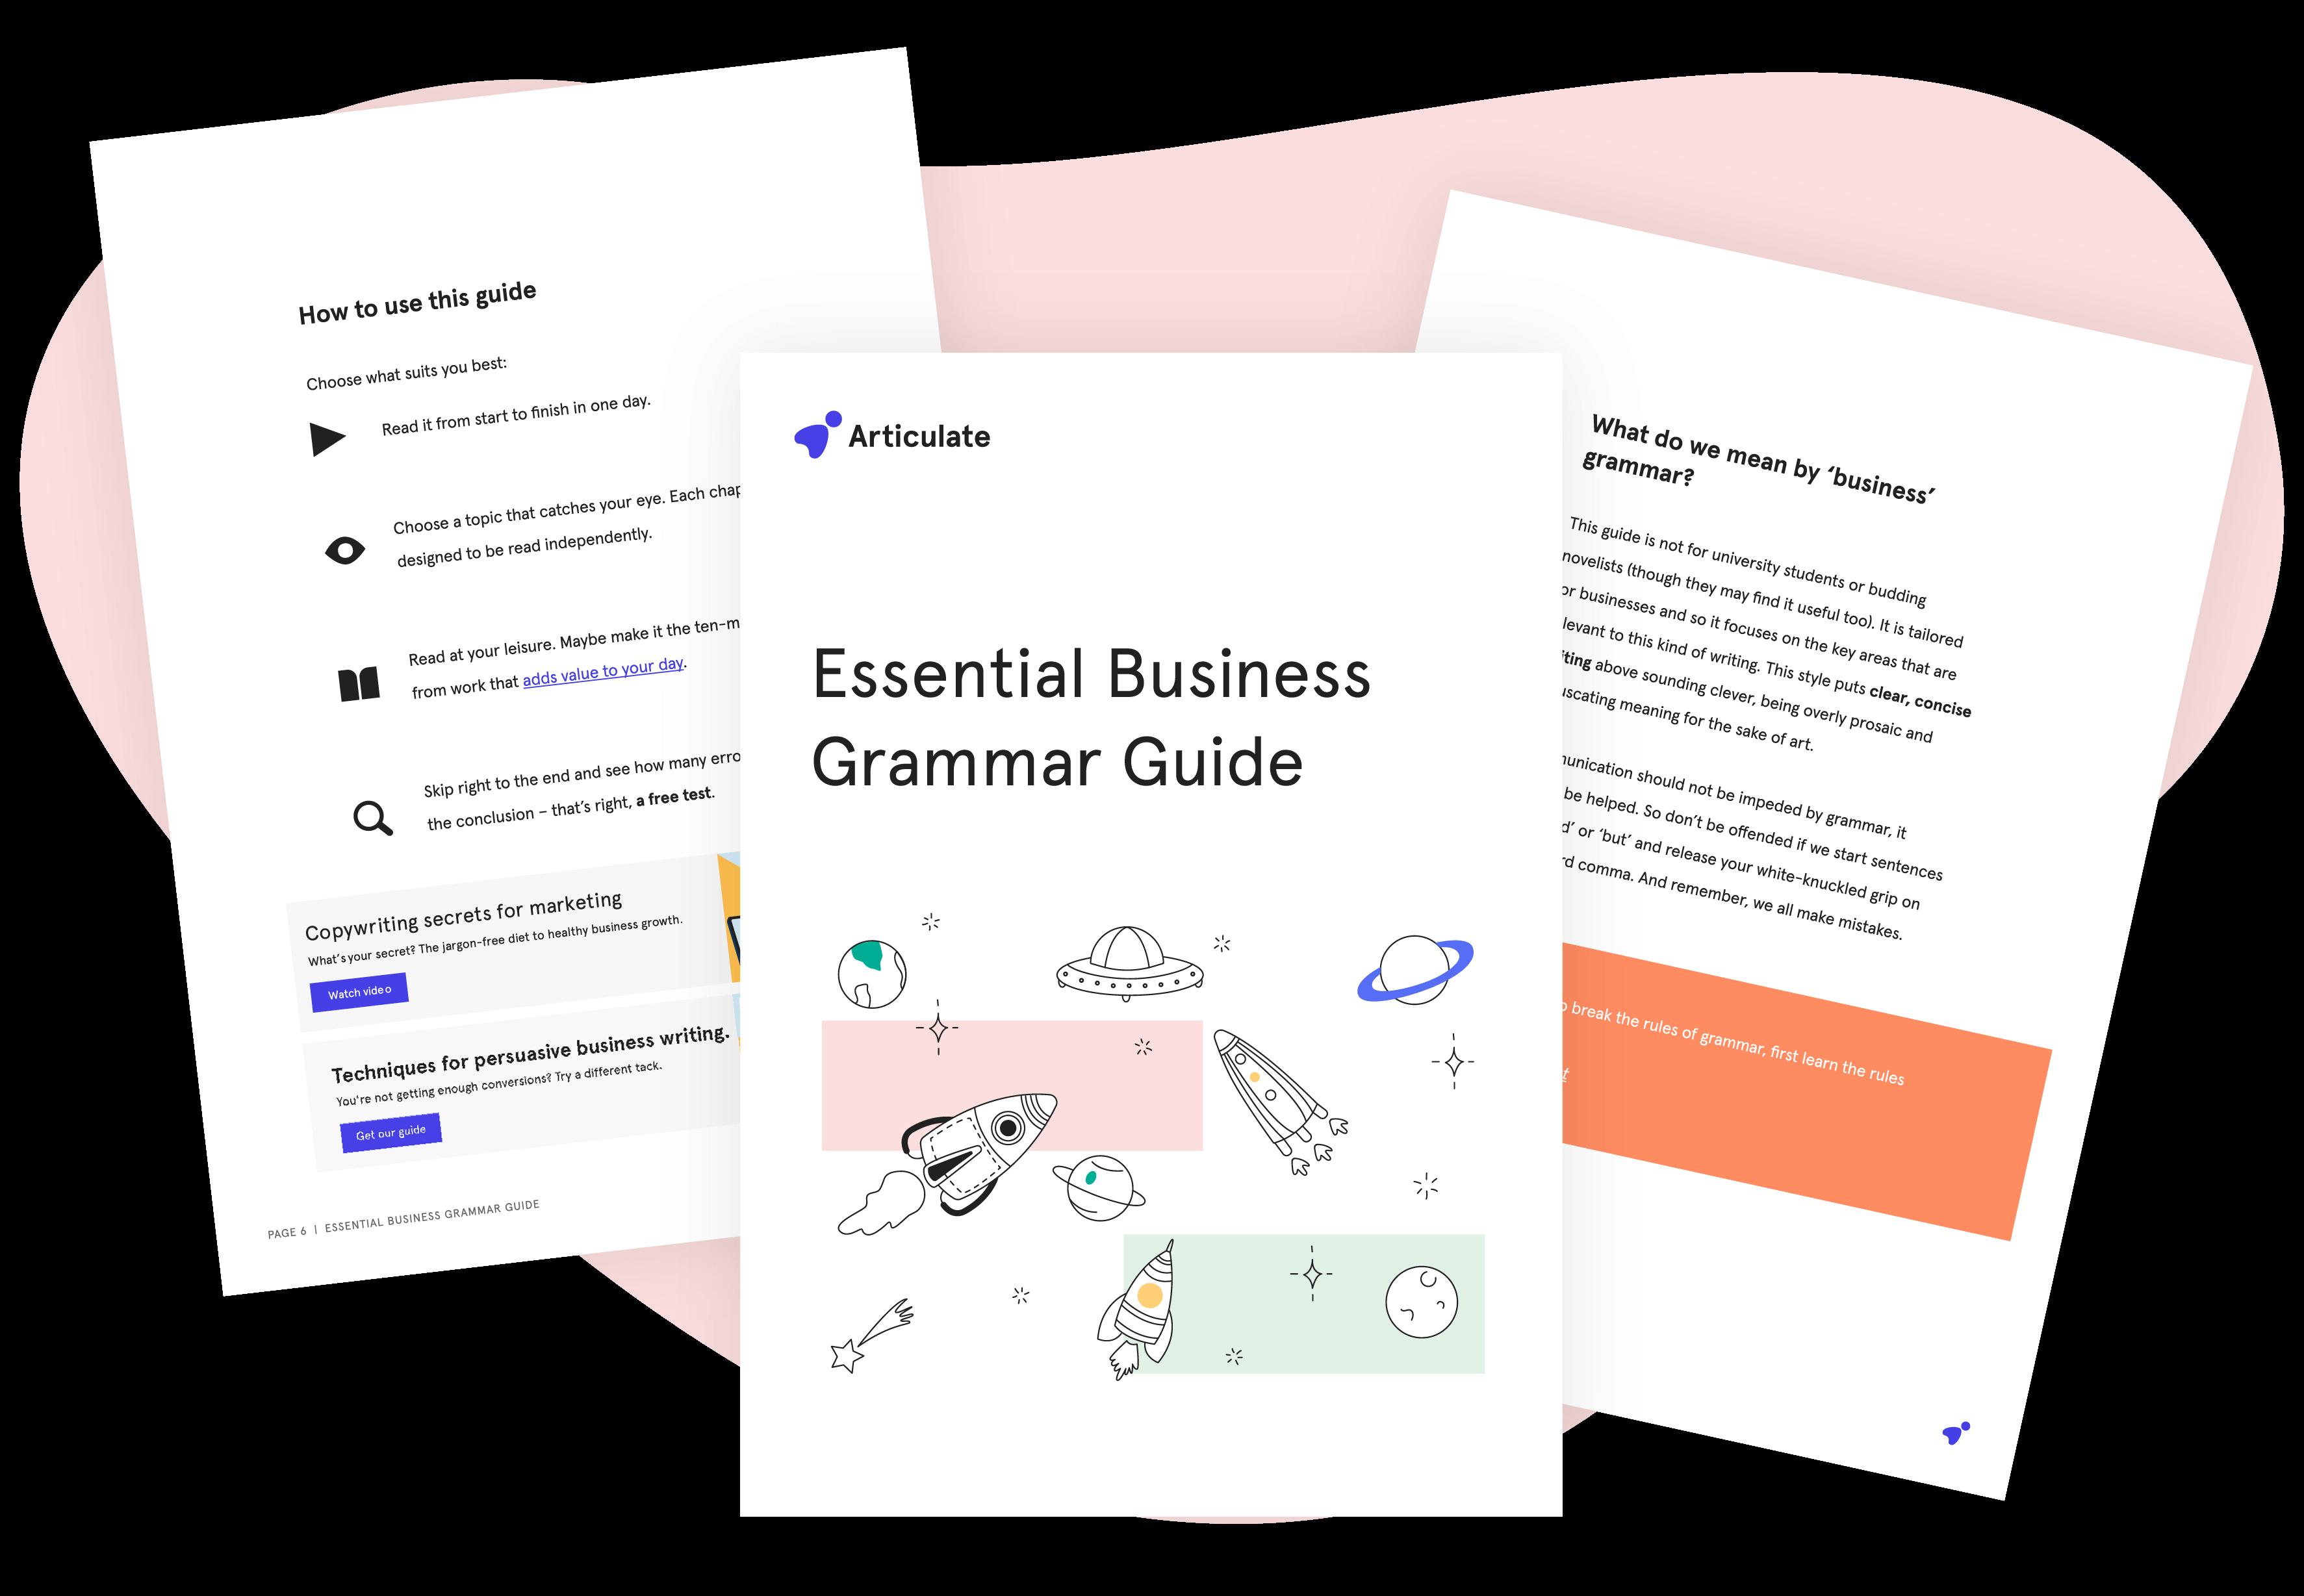 Essential Business Grammar Guide